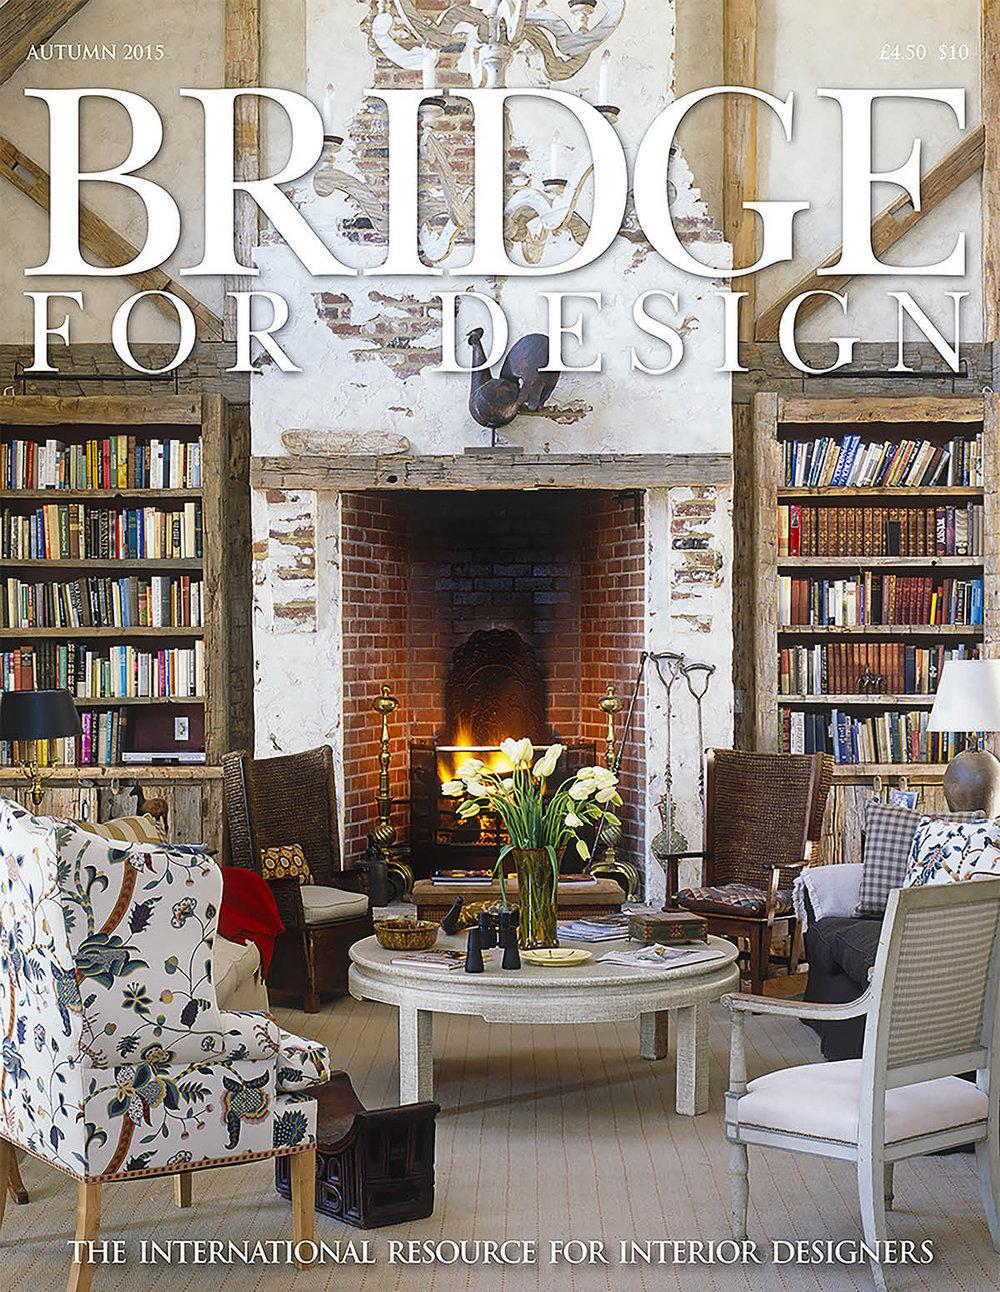 Bridge For Design 2015 - Michael Wolk